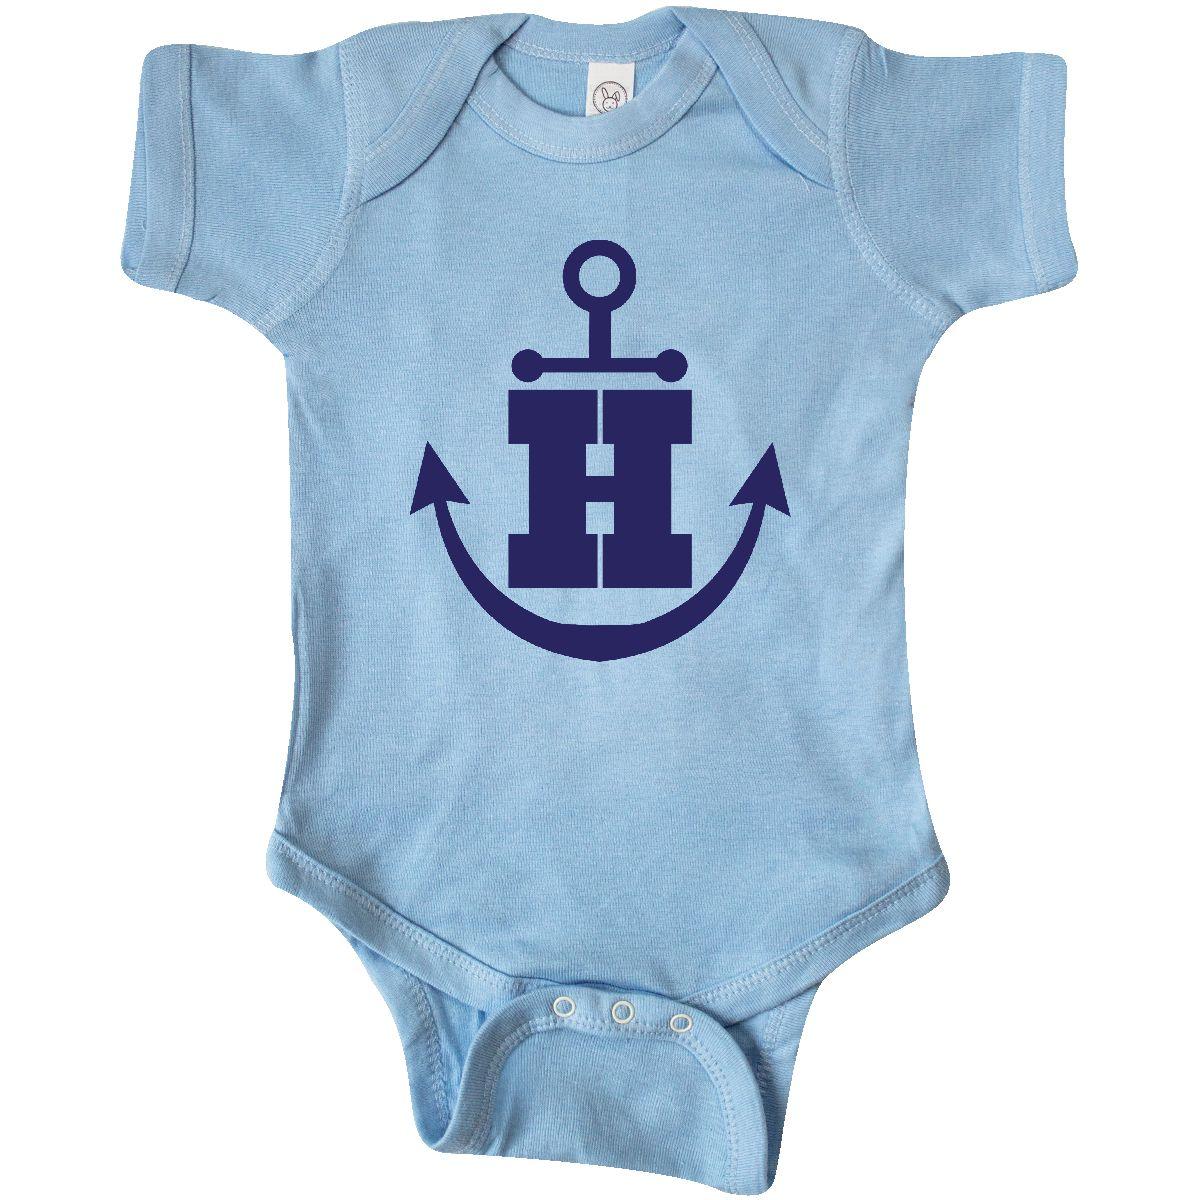 5e430b56f Inktastic Monogram Anchor Letter H Infant Bodysuit Initial Name ...